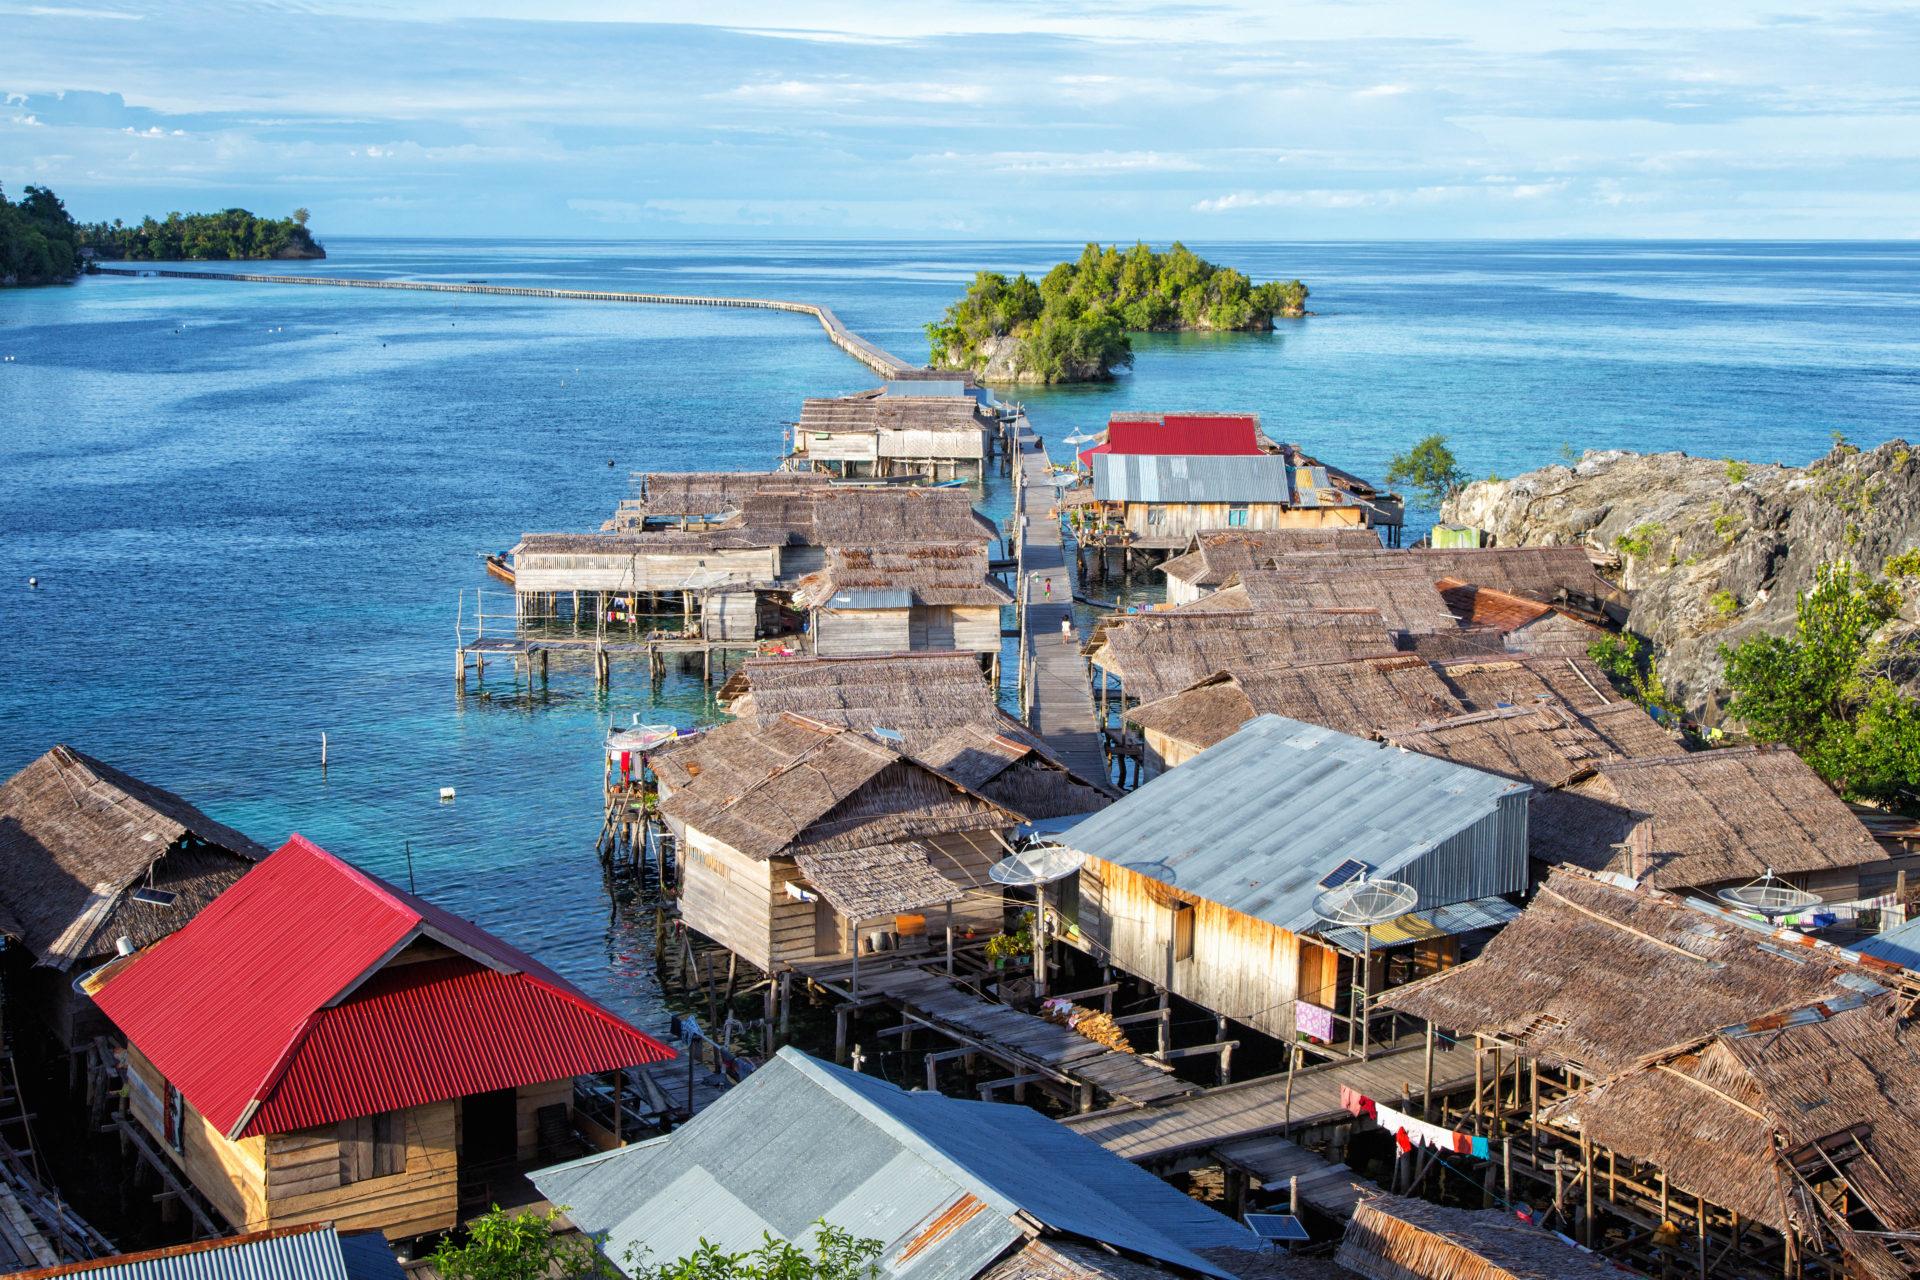 Pulau Papan, Togian Islands, Sulawesi, Indonesia